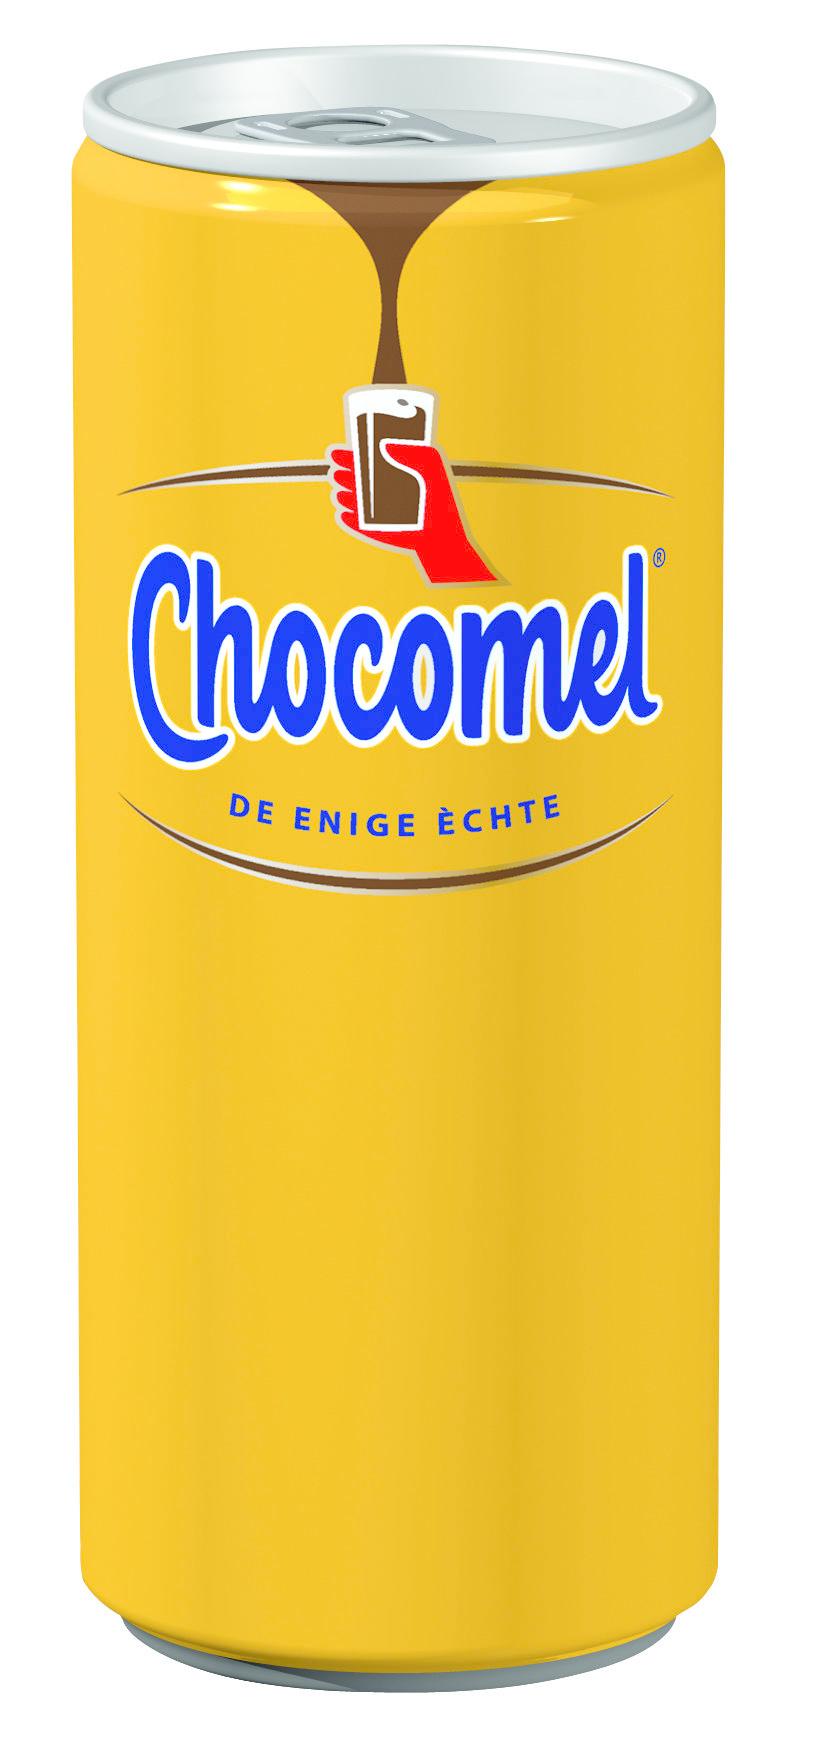 Chocomel Chocomel - Chocomel 25Cl Blik, 24 Blikken